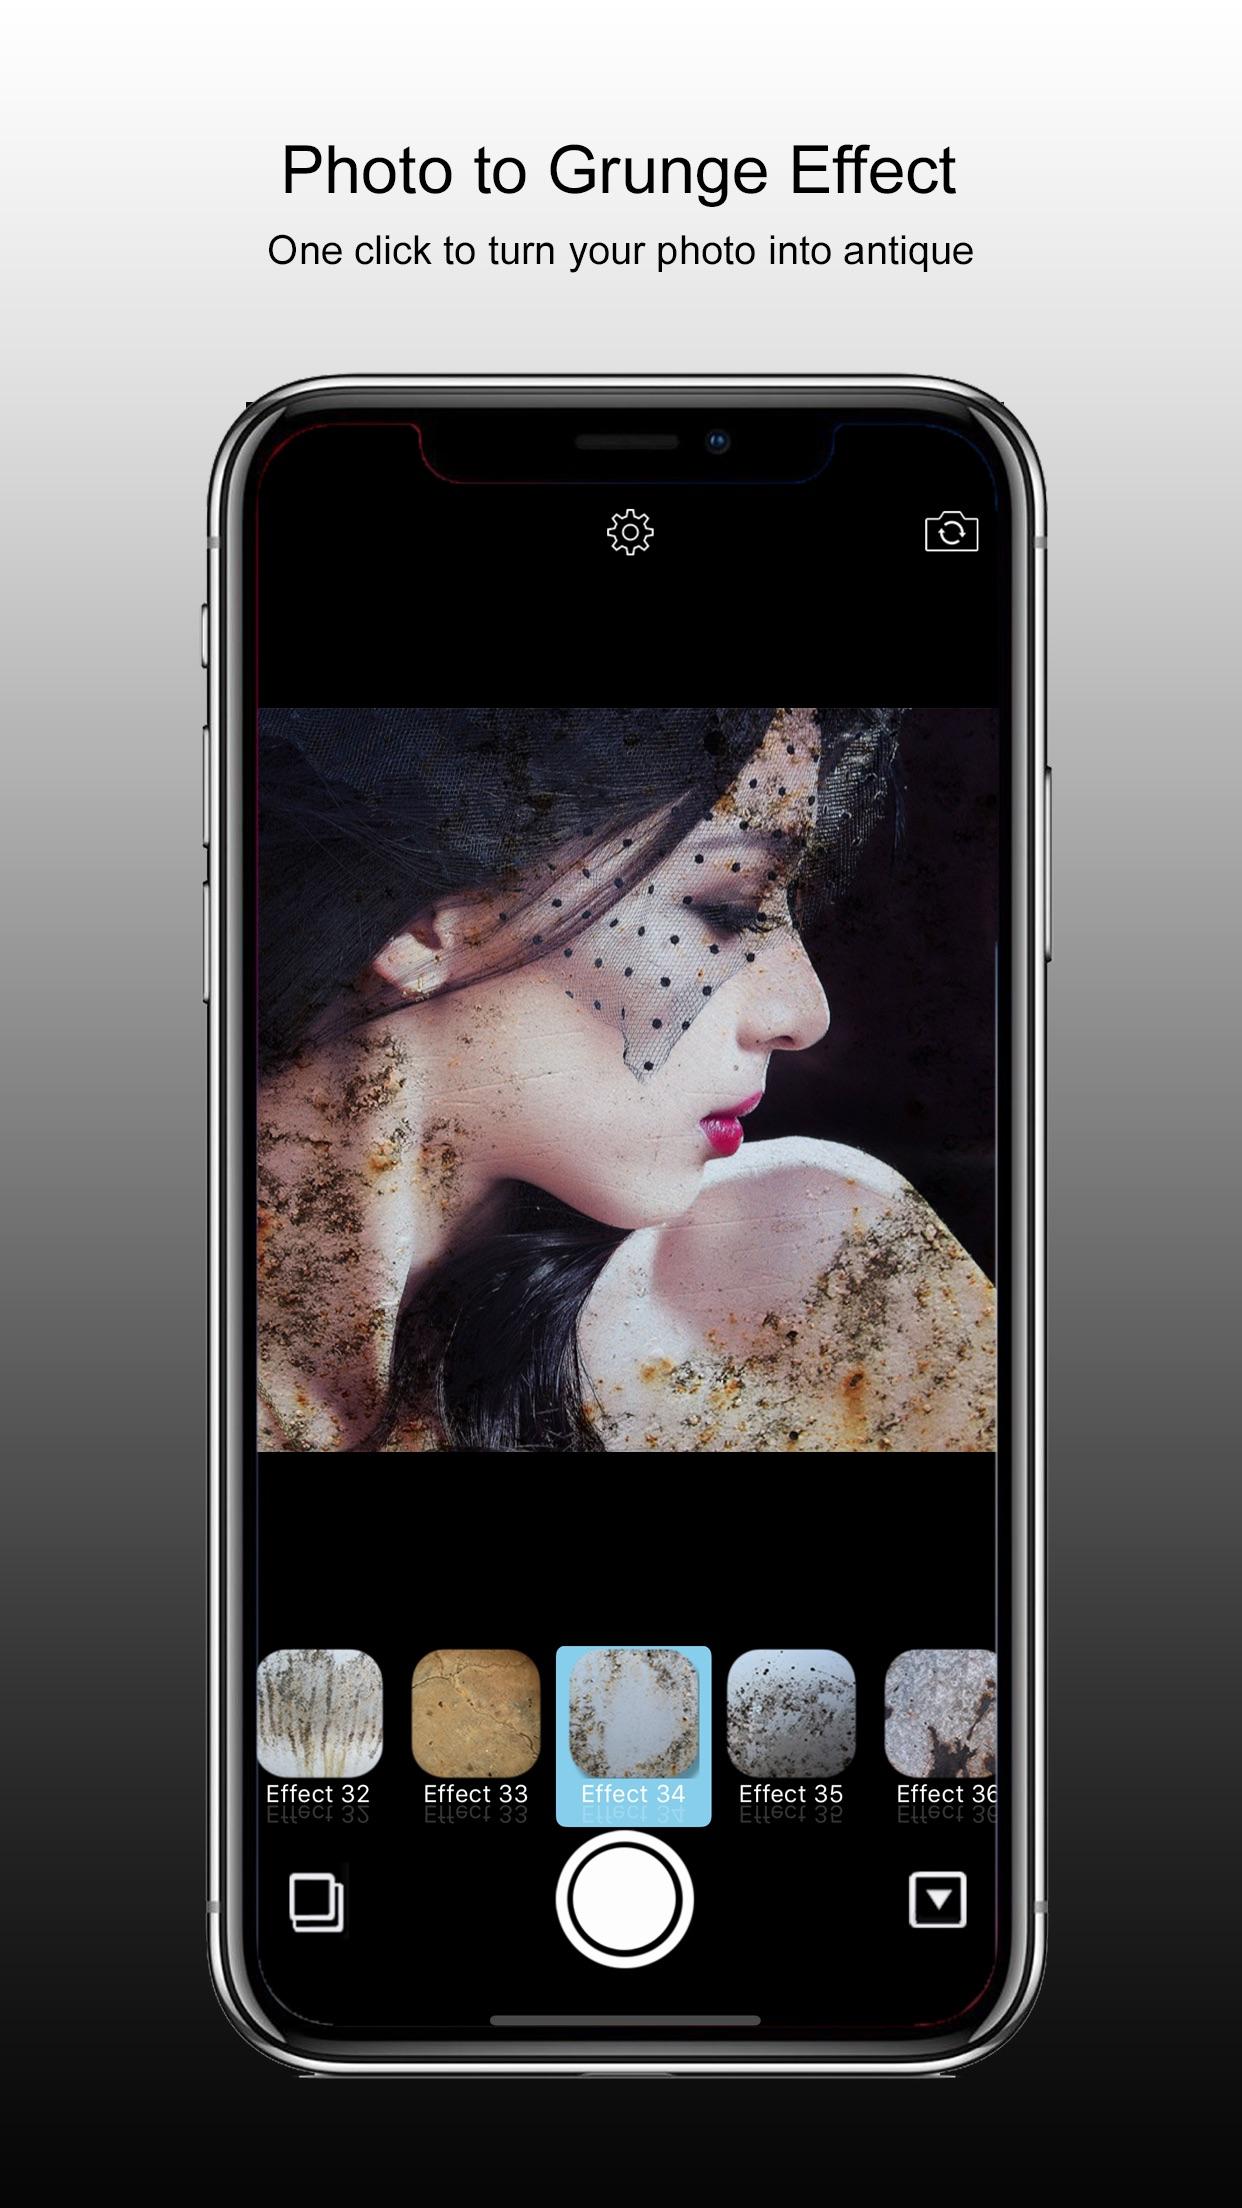 PhotoJus Grunge FX Pro Screenshot